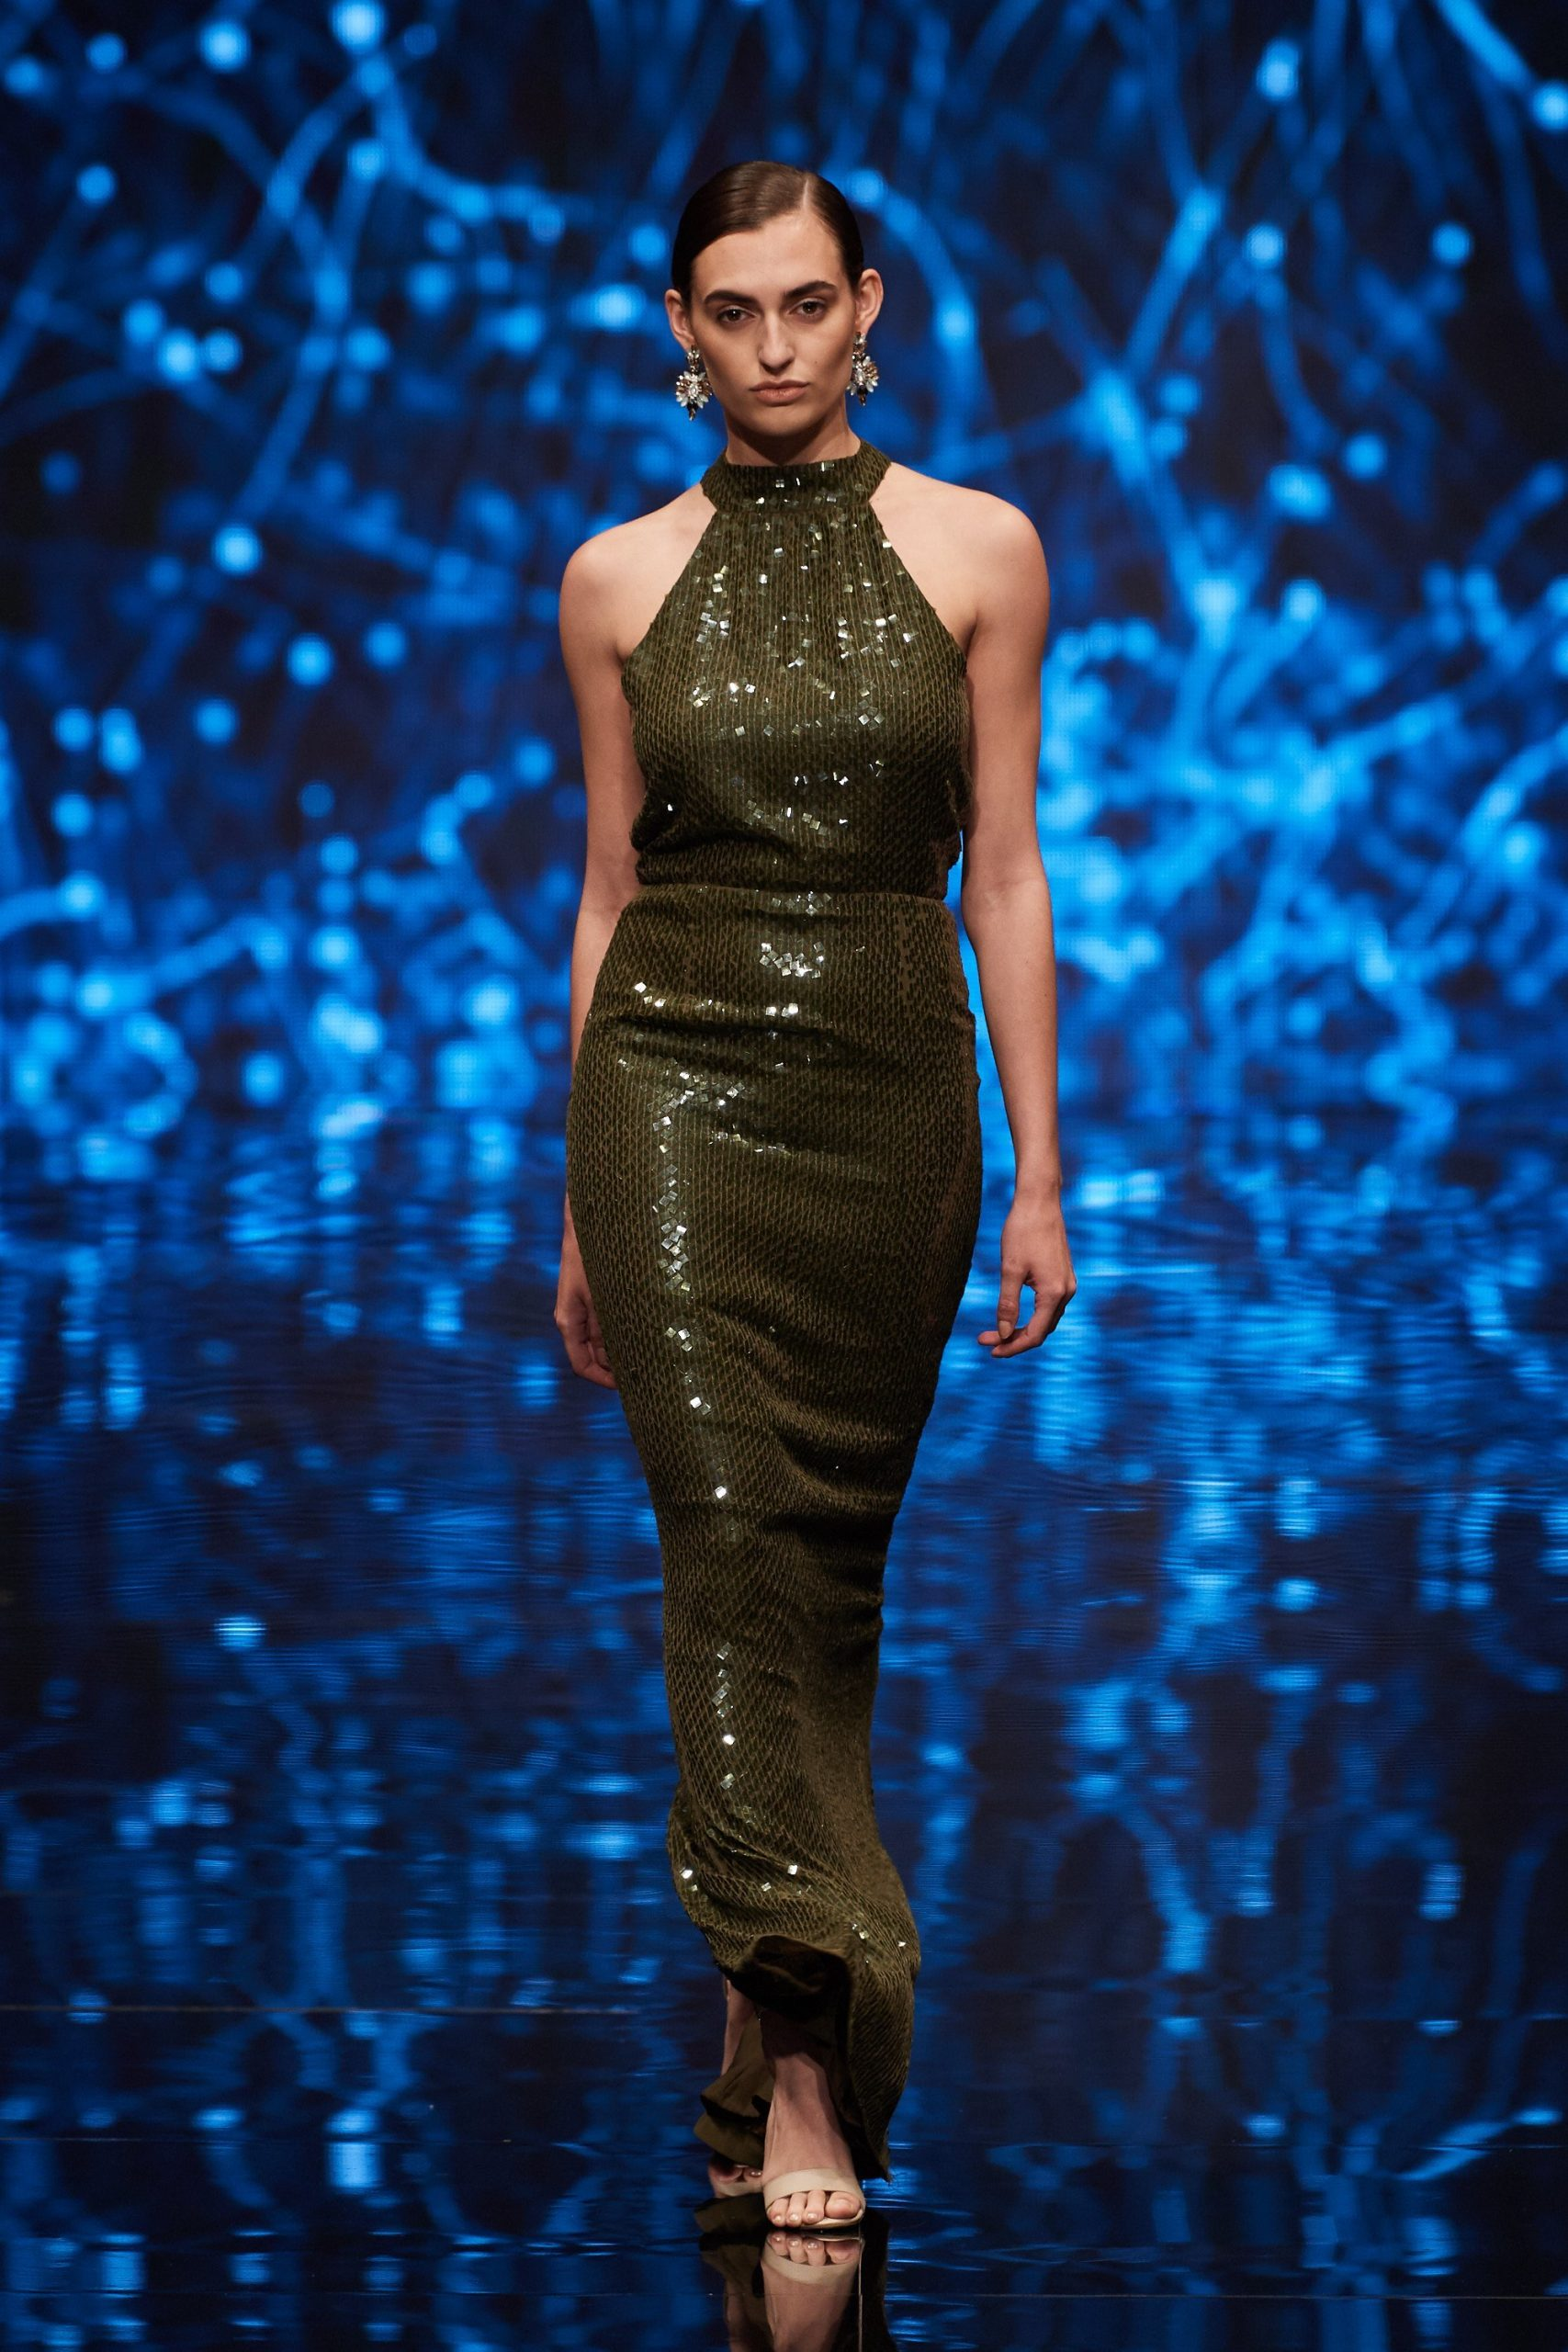 Rachel Gilbert runway at the Telstra Perth Fashion Festival 2017